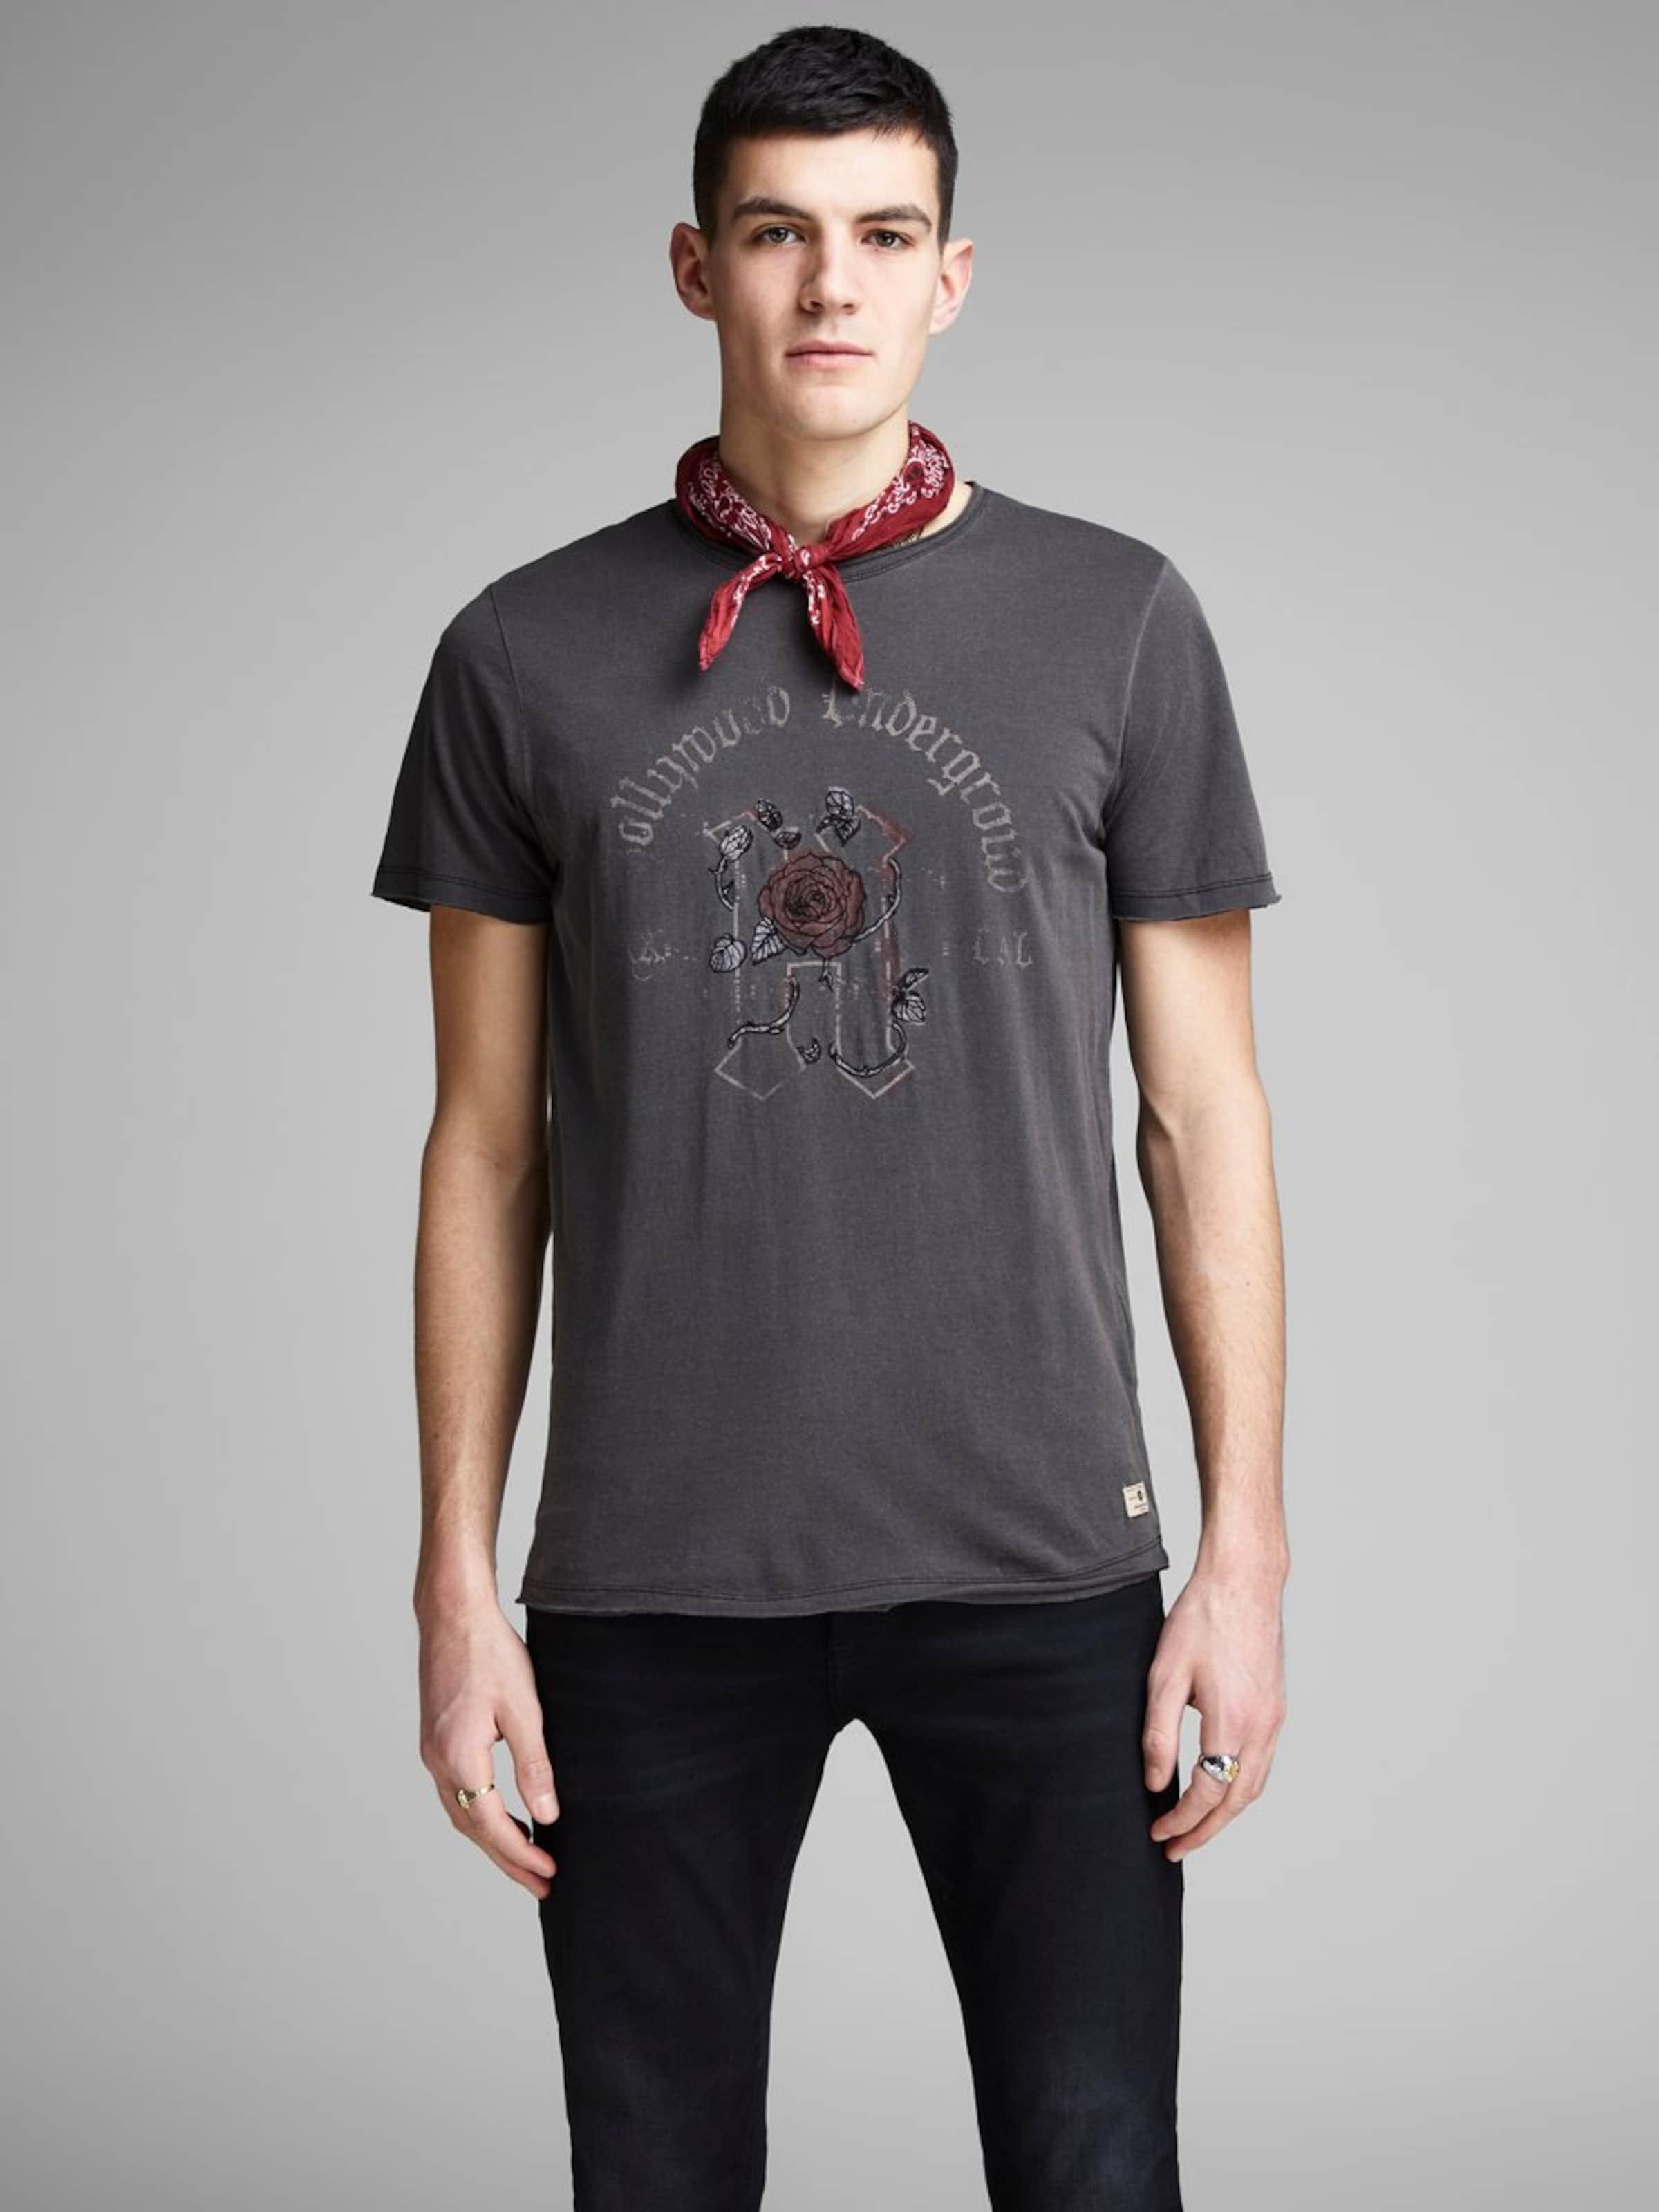 Jones FoncéAnthracite Jackamp; T shirt En Brun 3A4Rjc5Lq